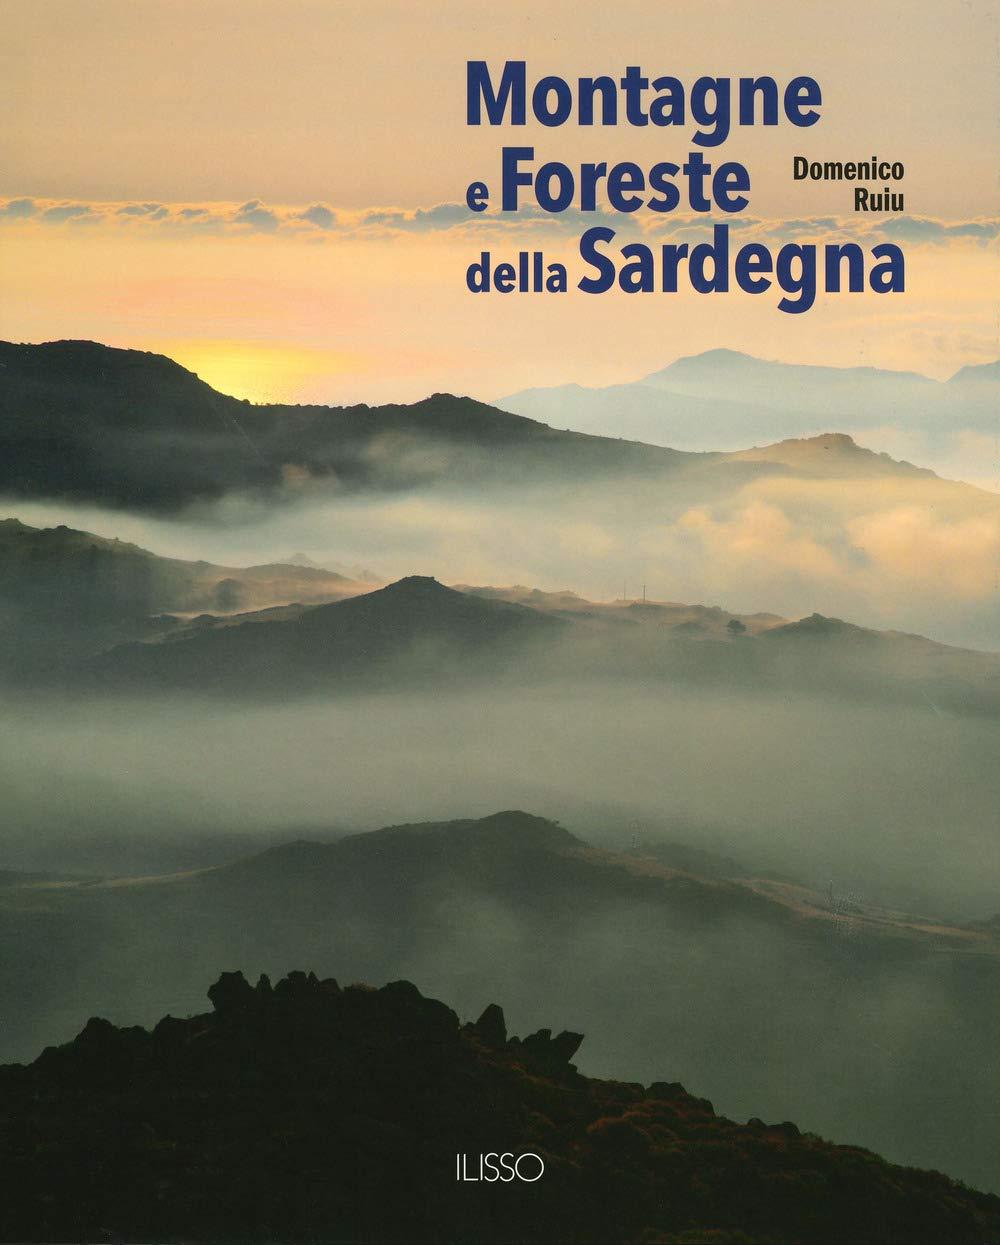 Montagne e foreste della Sardegna. Ediz. illustrata